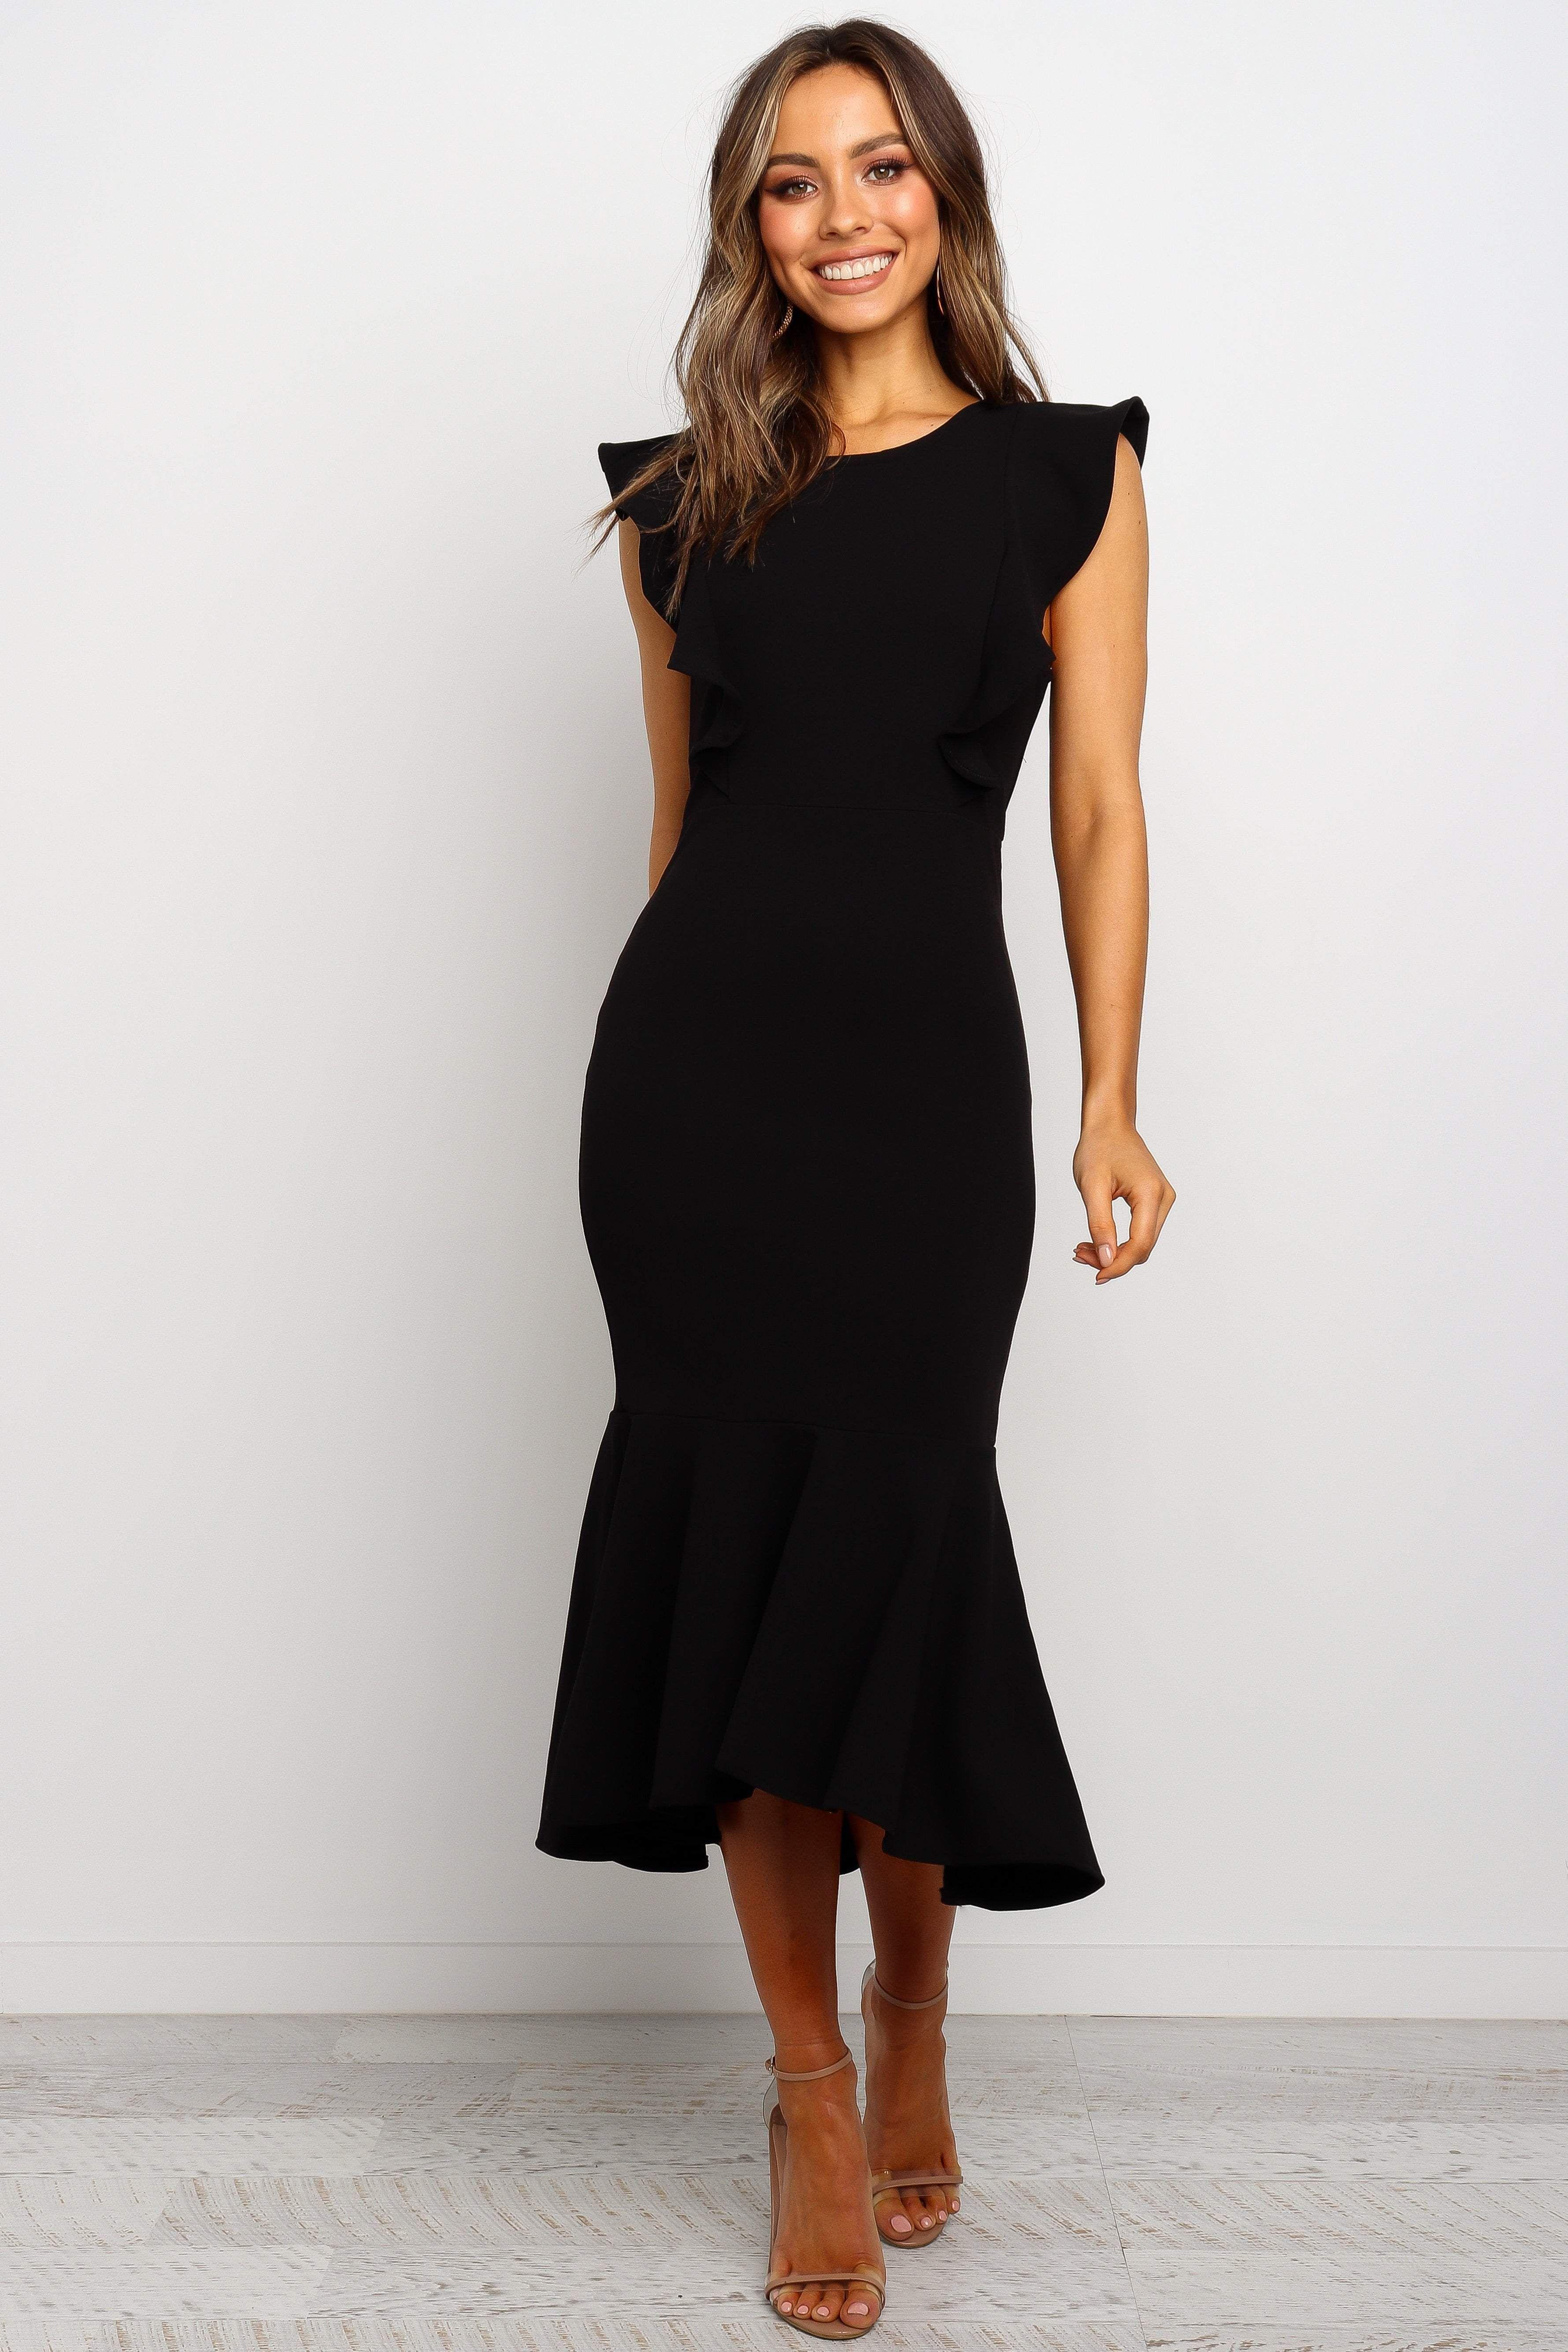 Nolita Dress Black 8 Black Knee Length Dress Little Black Cocktail Dress Nolita Dress [ 5338 x 3559 Pixel ]